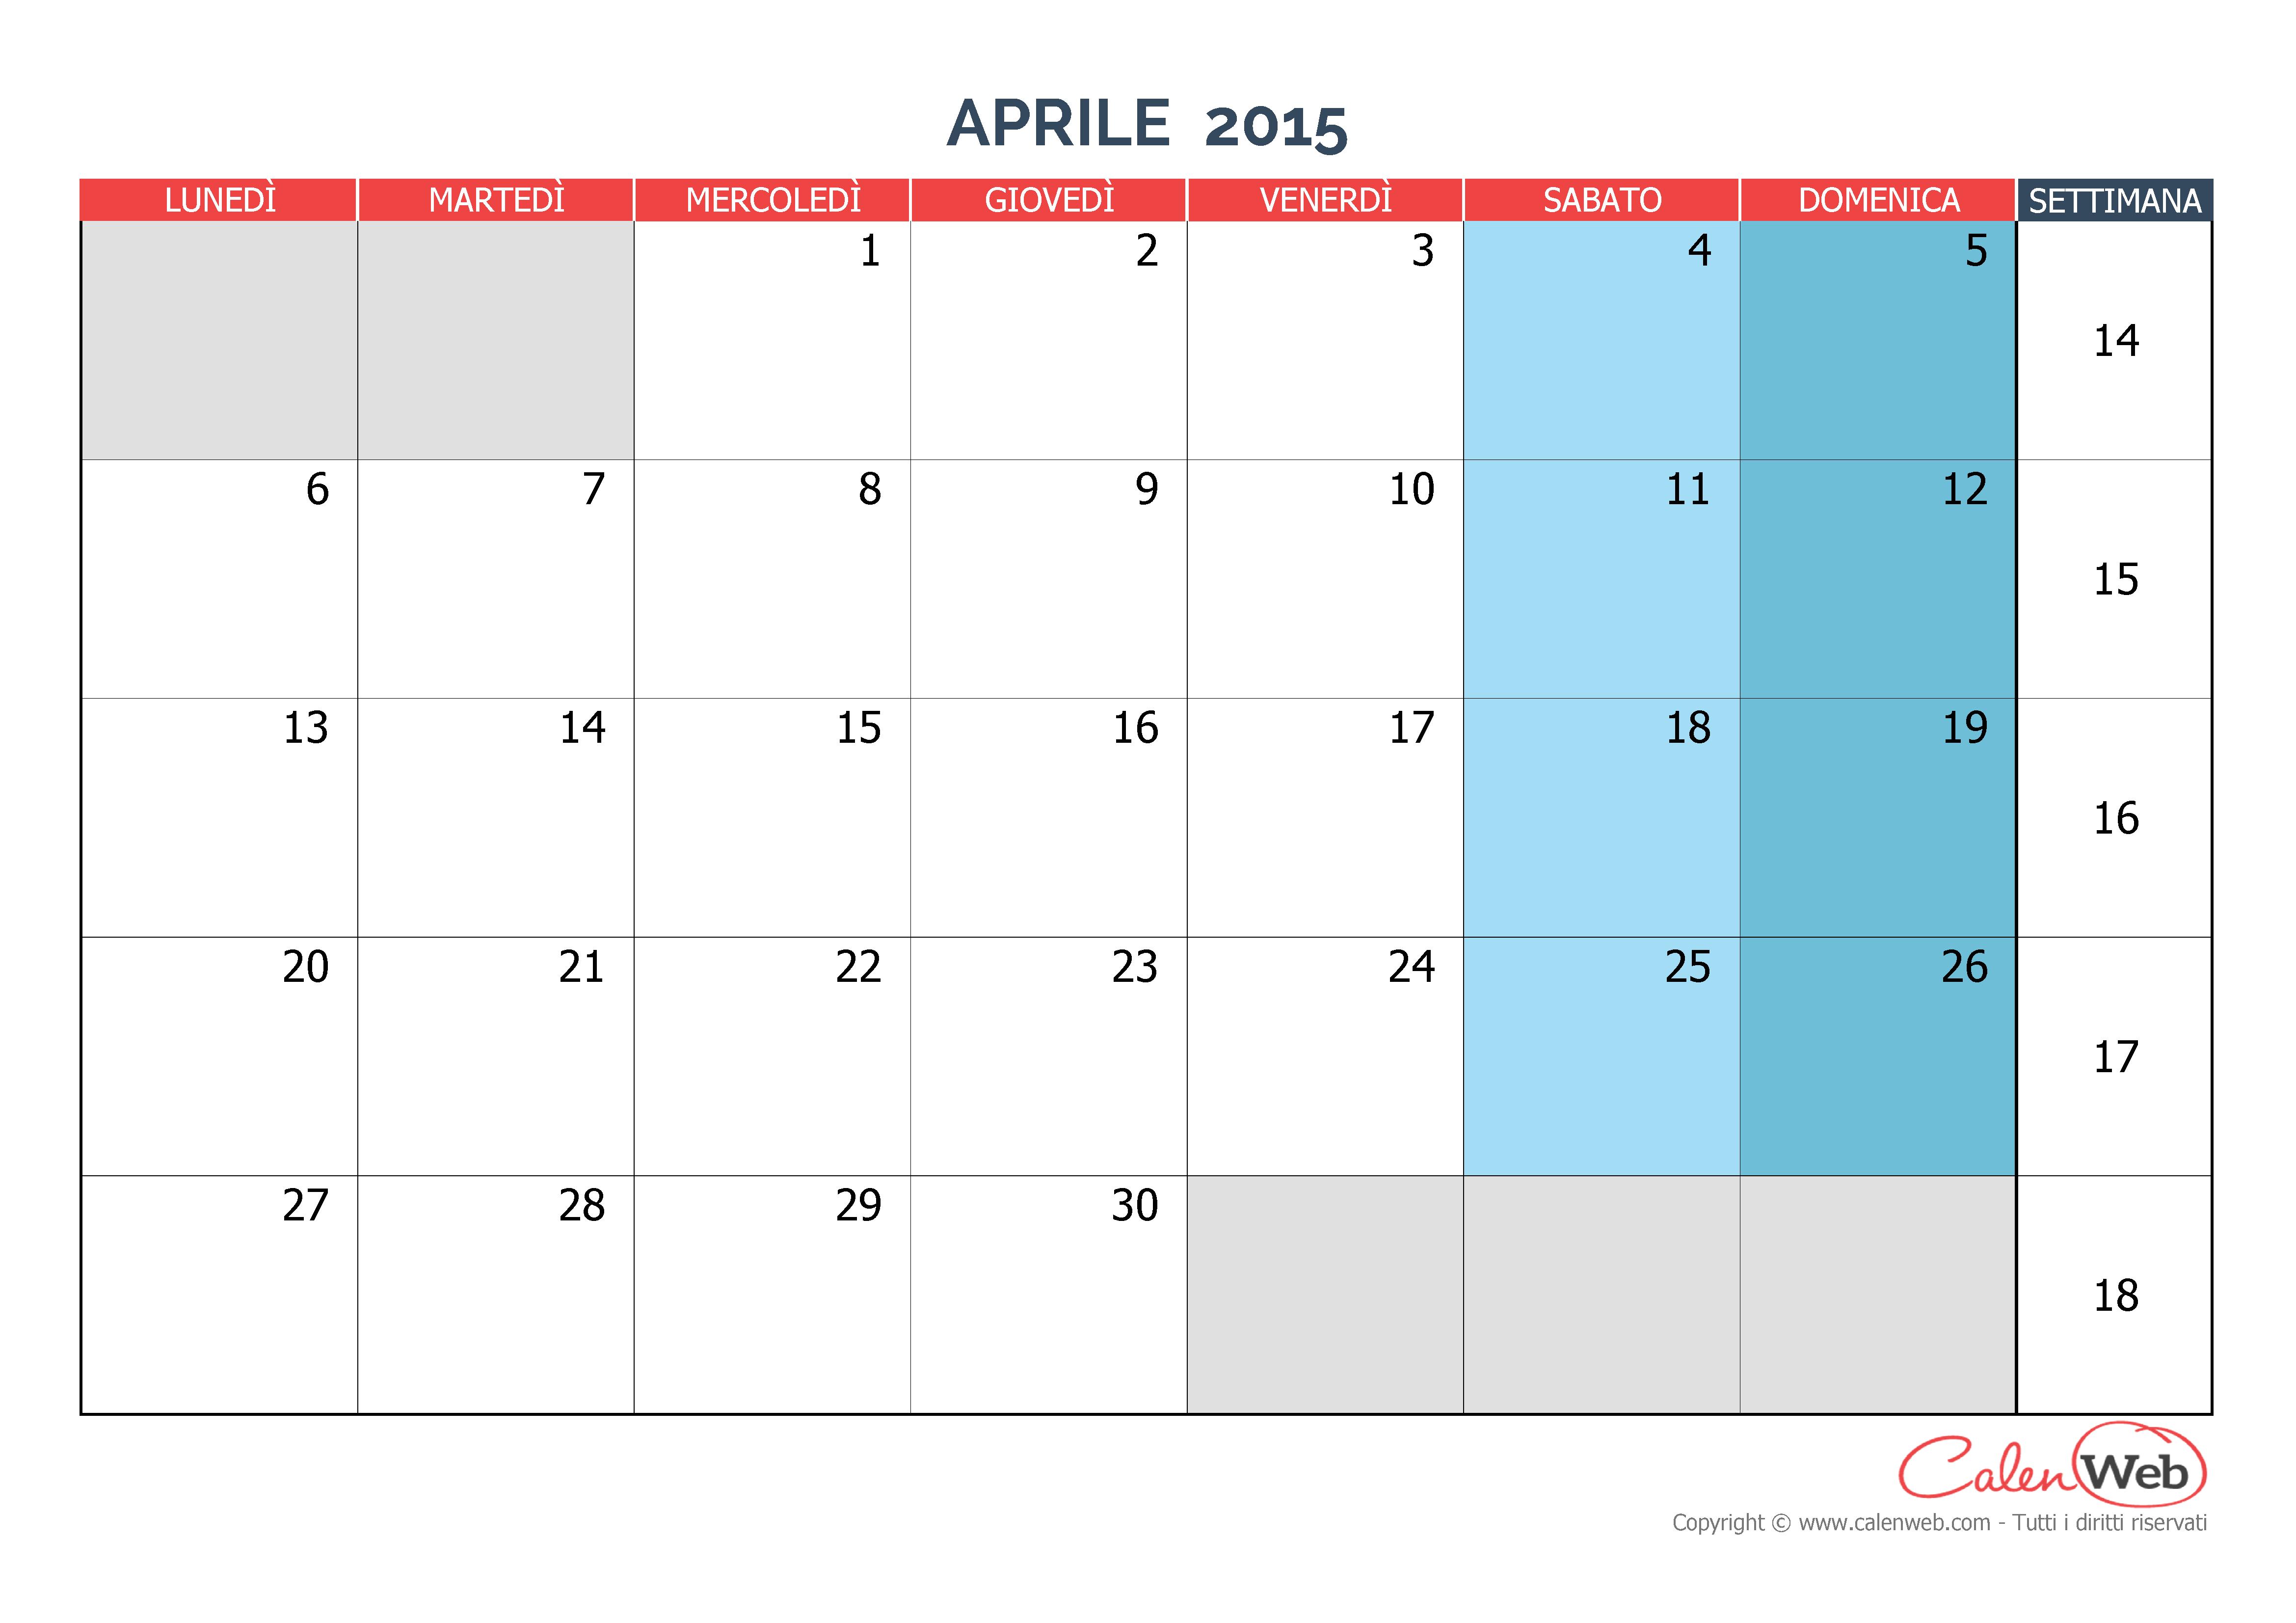 Calendario mensile - Mese di aprile 2015 Versione vergine - Calenweb ...